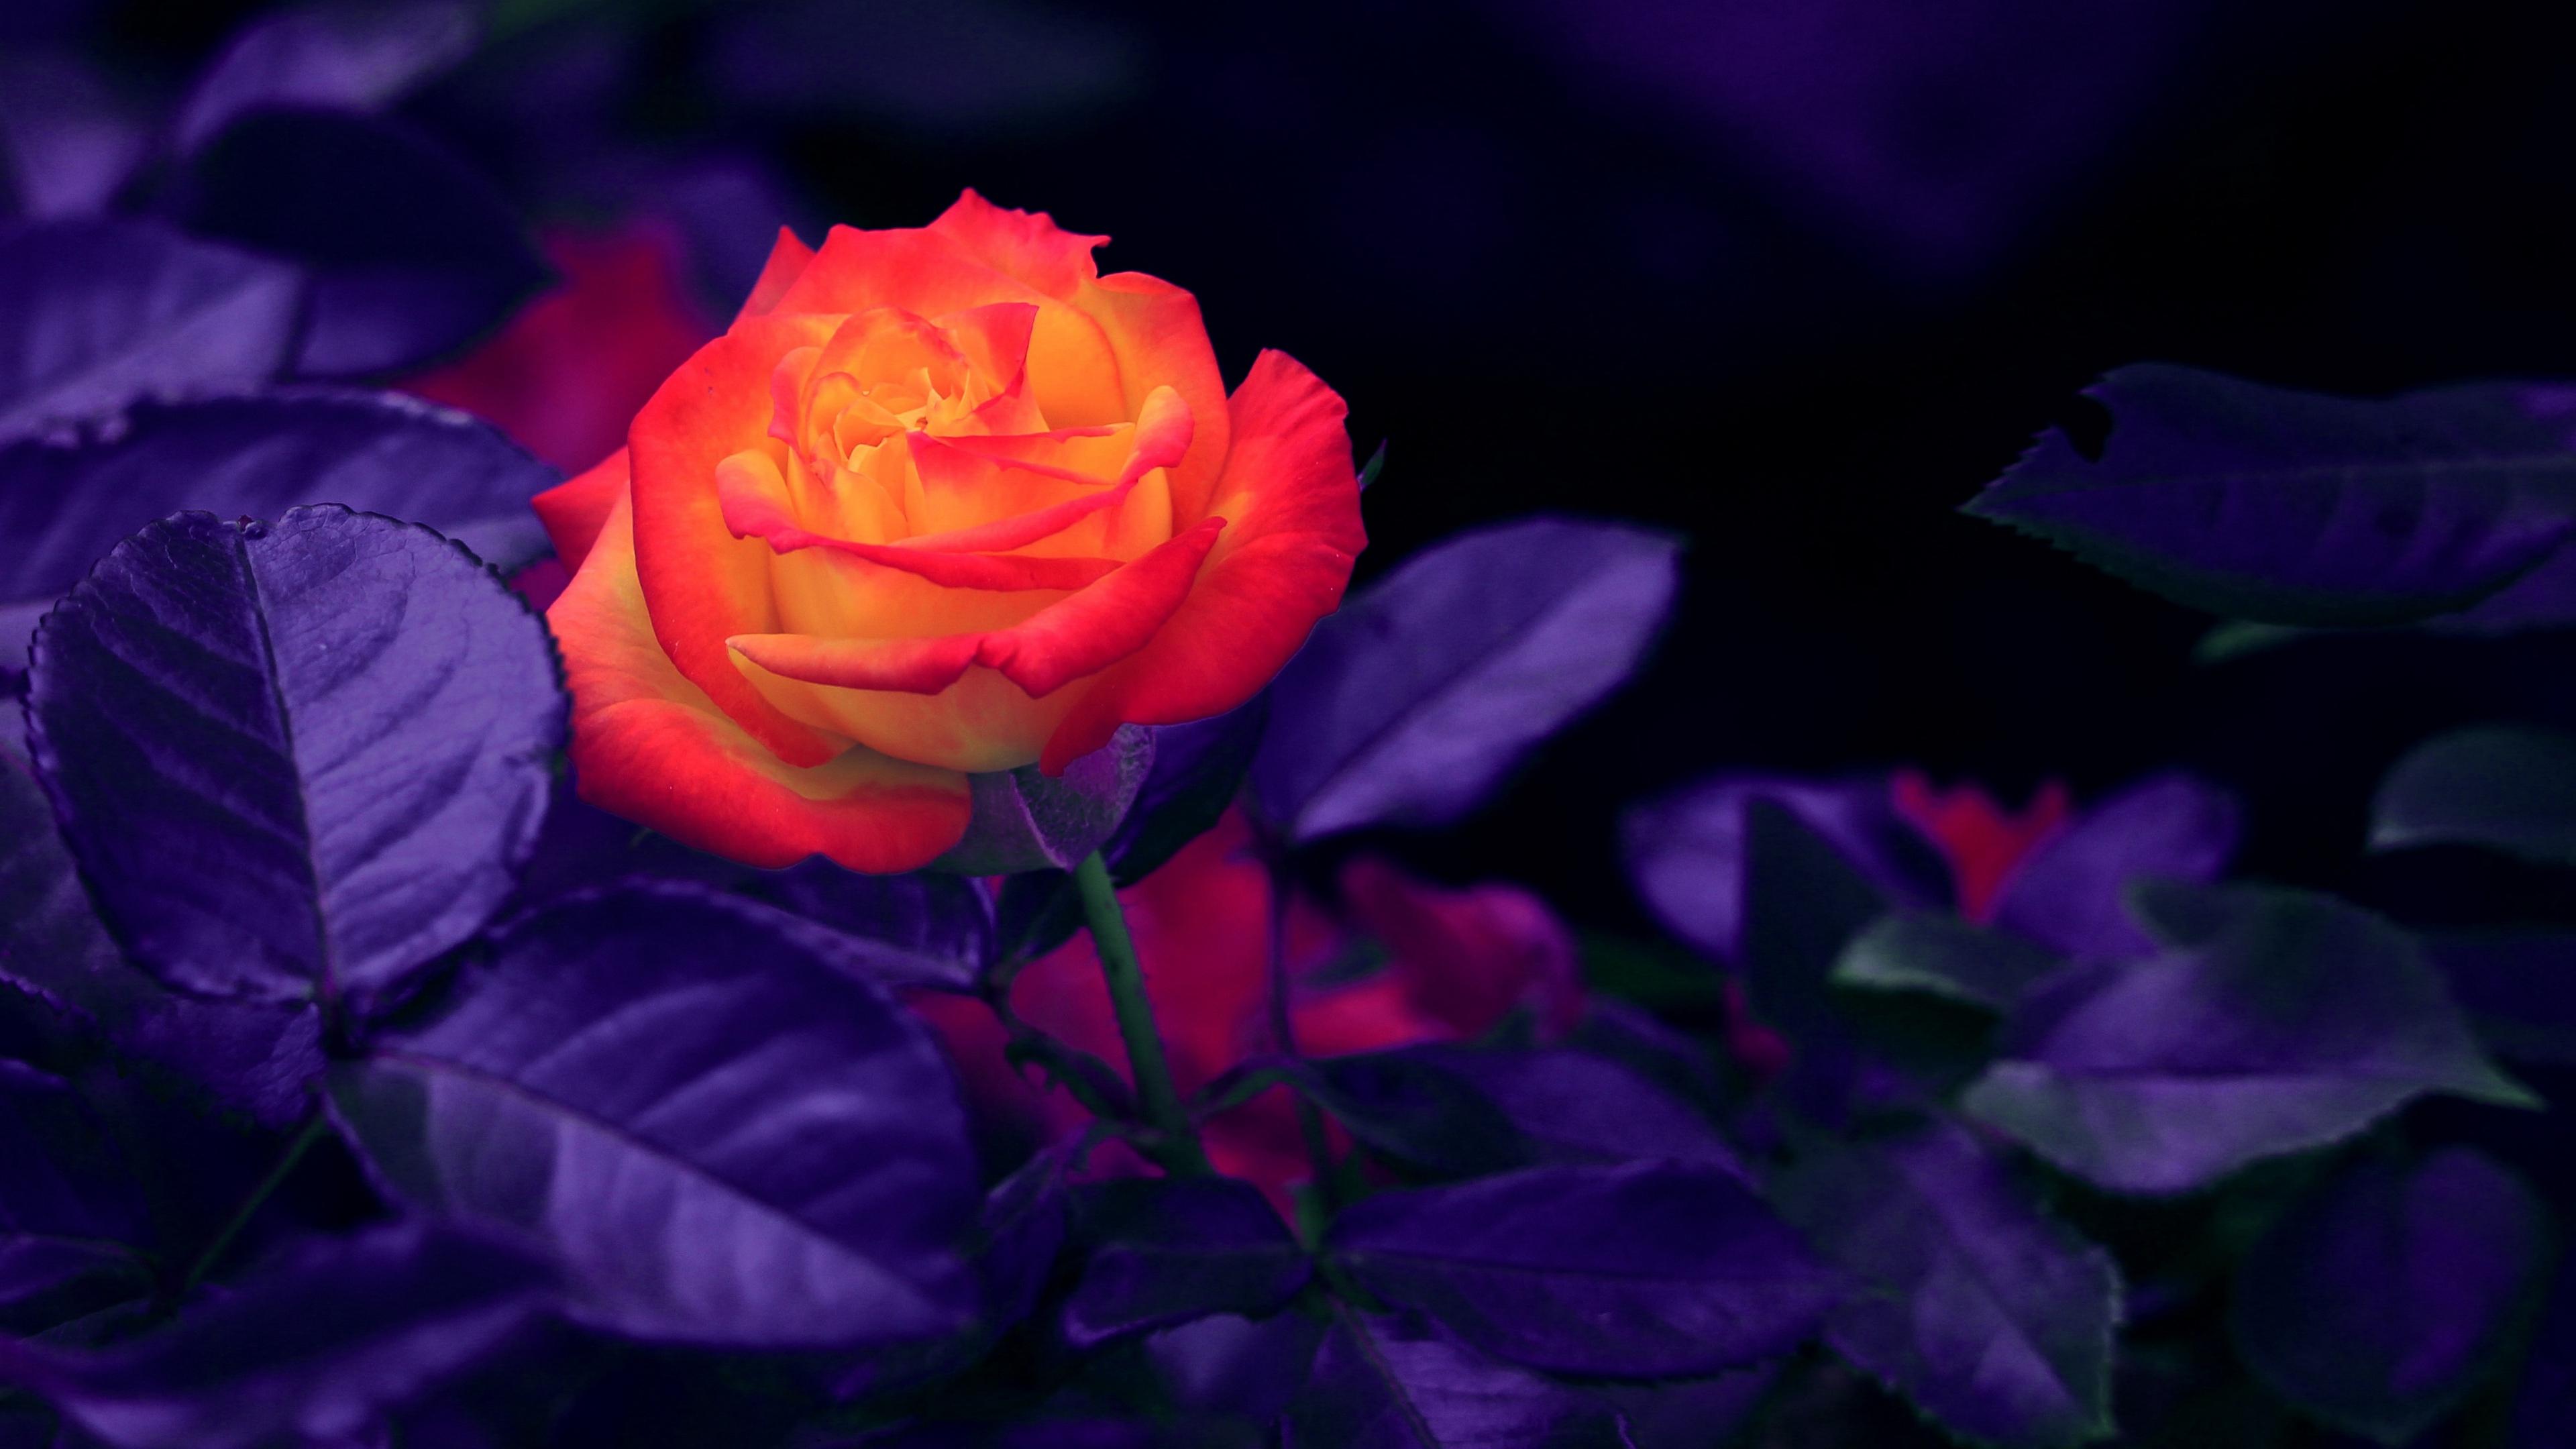 rose bud orange purple 4k 1540064908 - rose, bud, orange, purple 4k - Rose, orange, bud